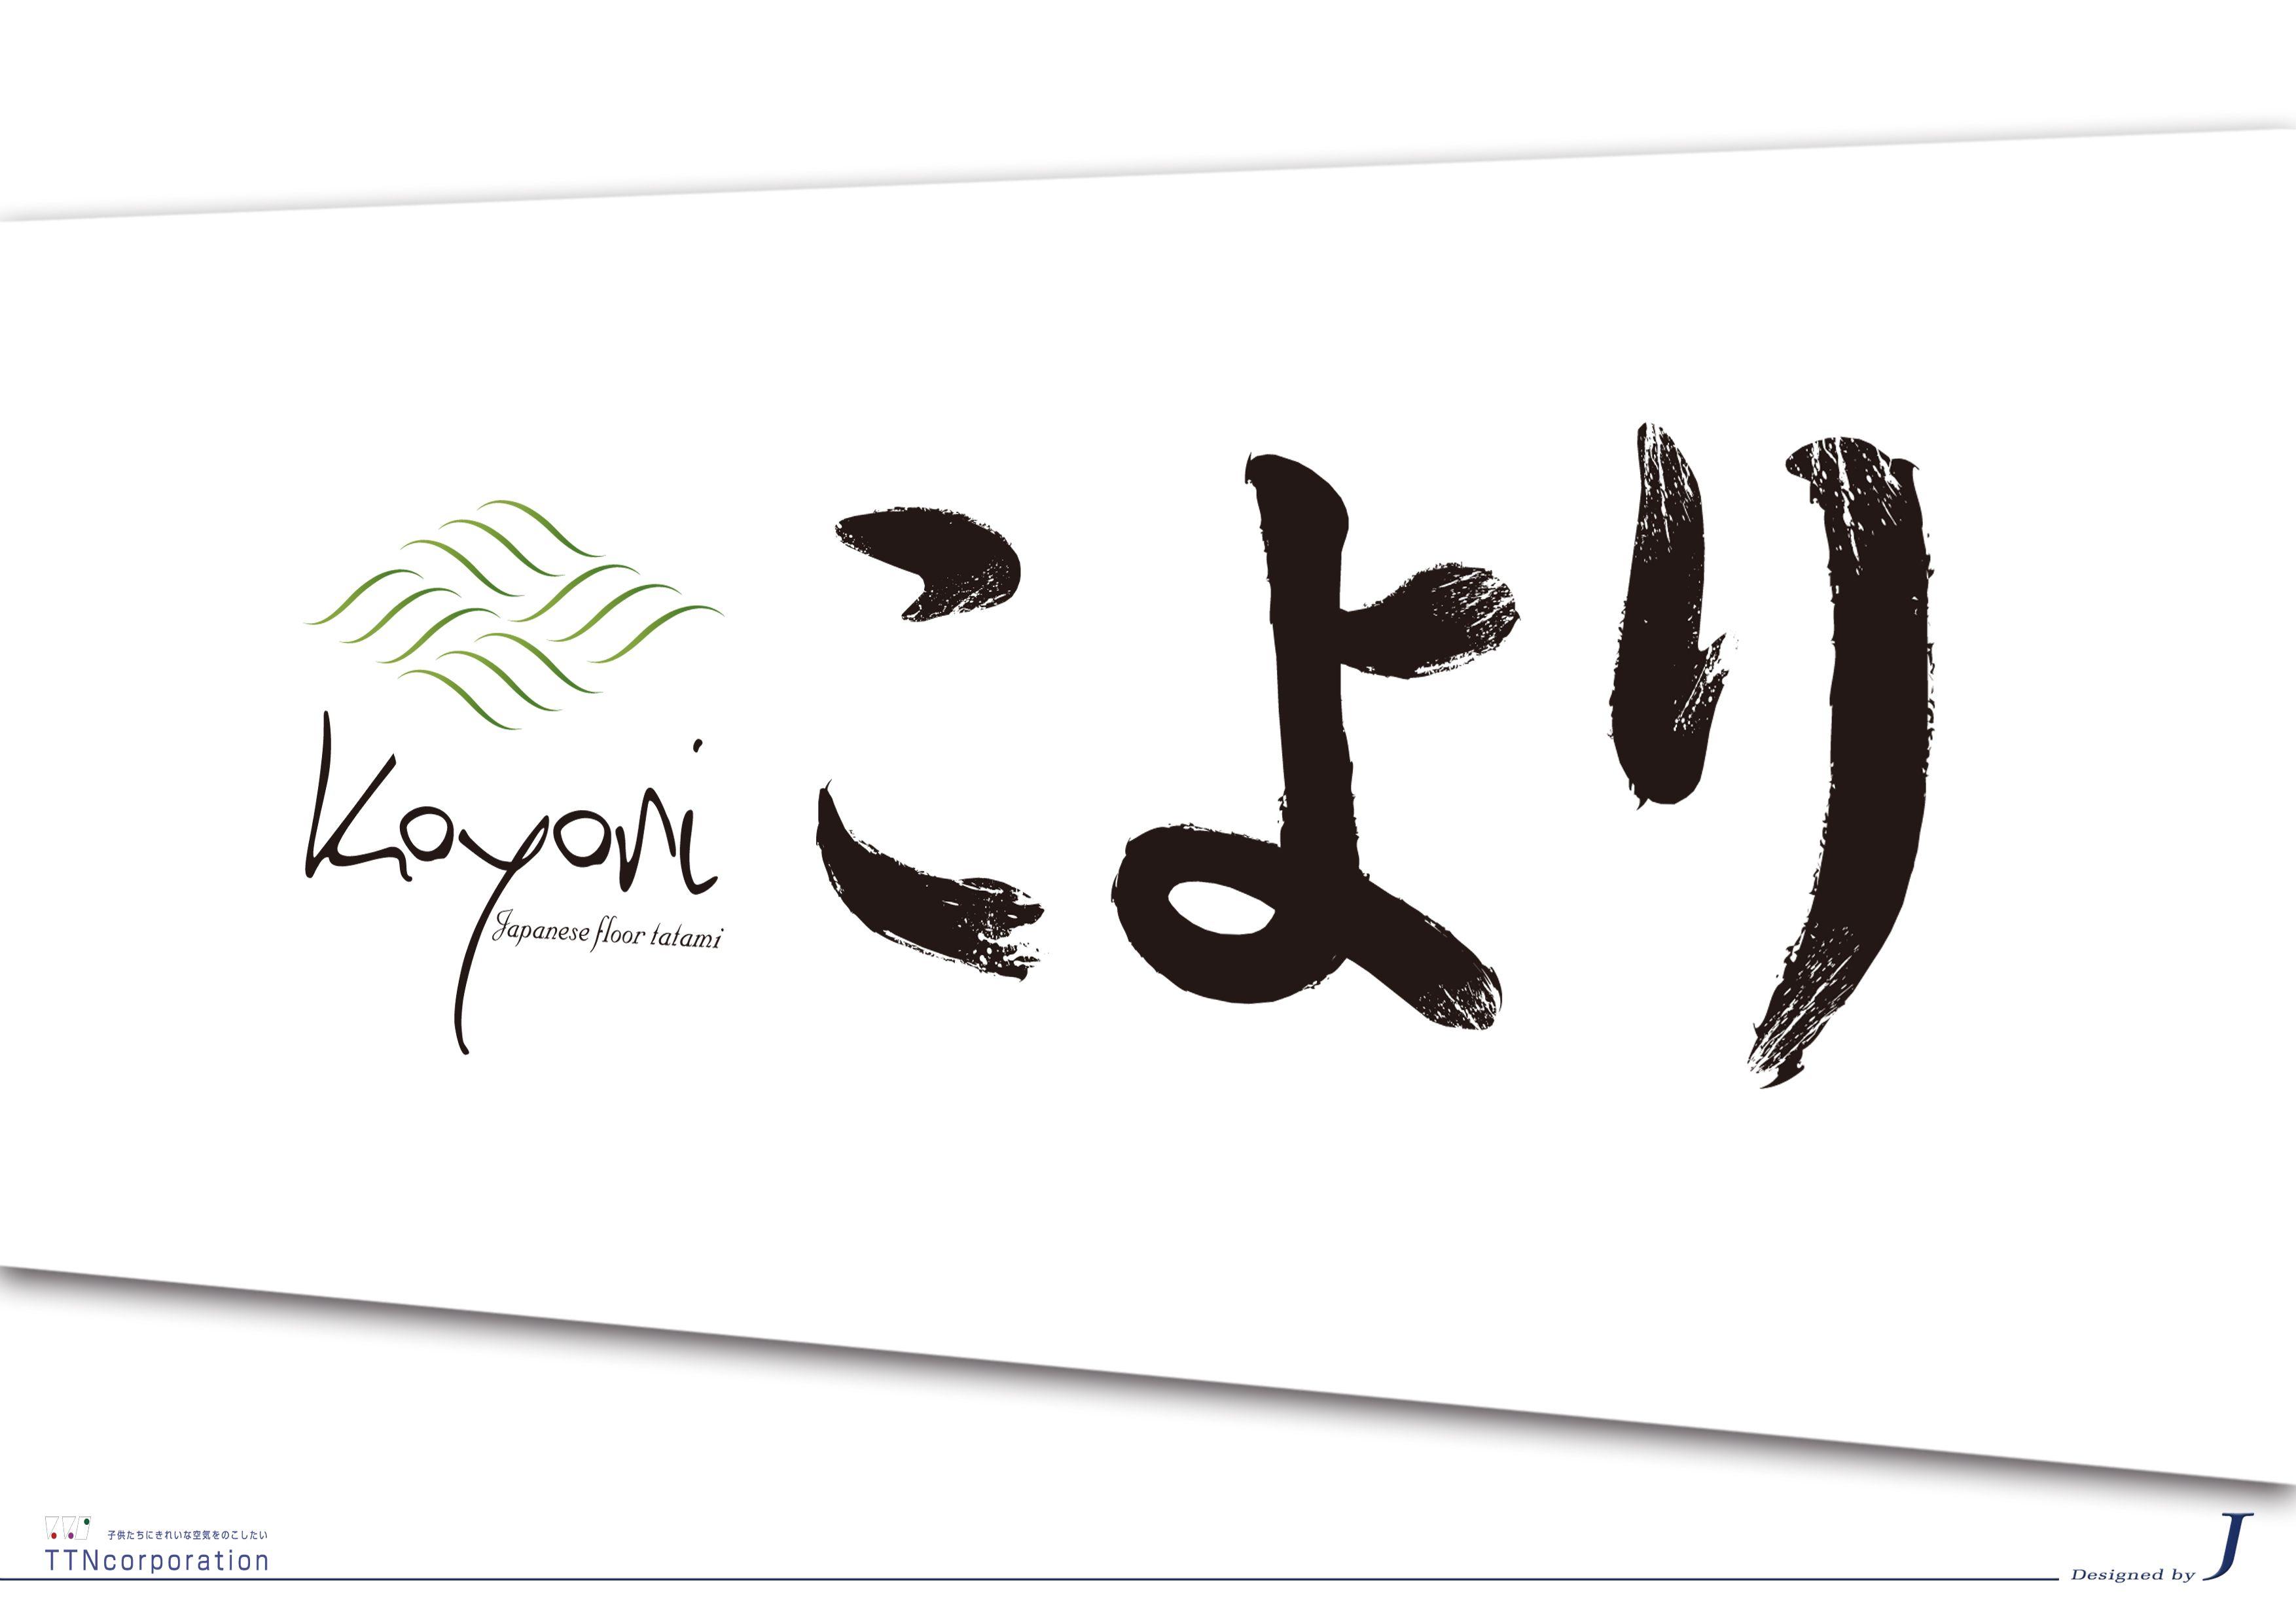 THE TATAMI FACTORY (since 1934)  NEW BRAND 『Koyori』